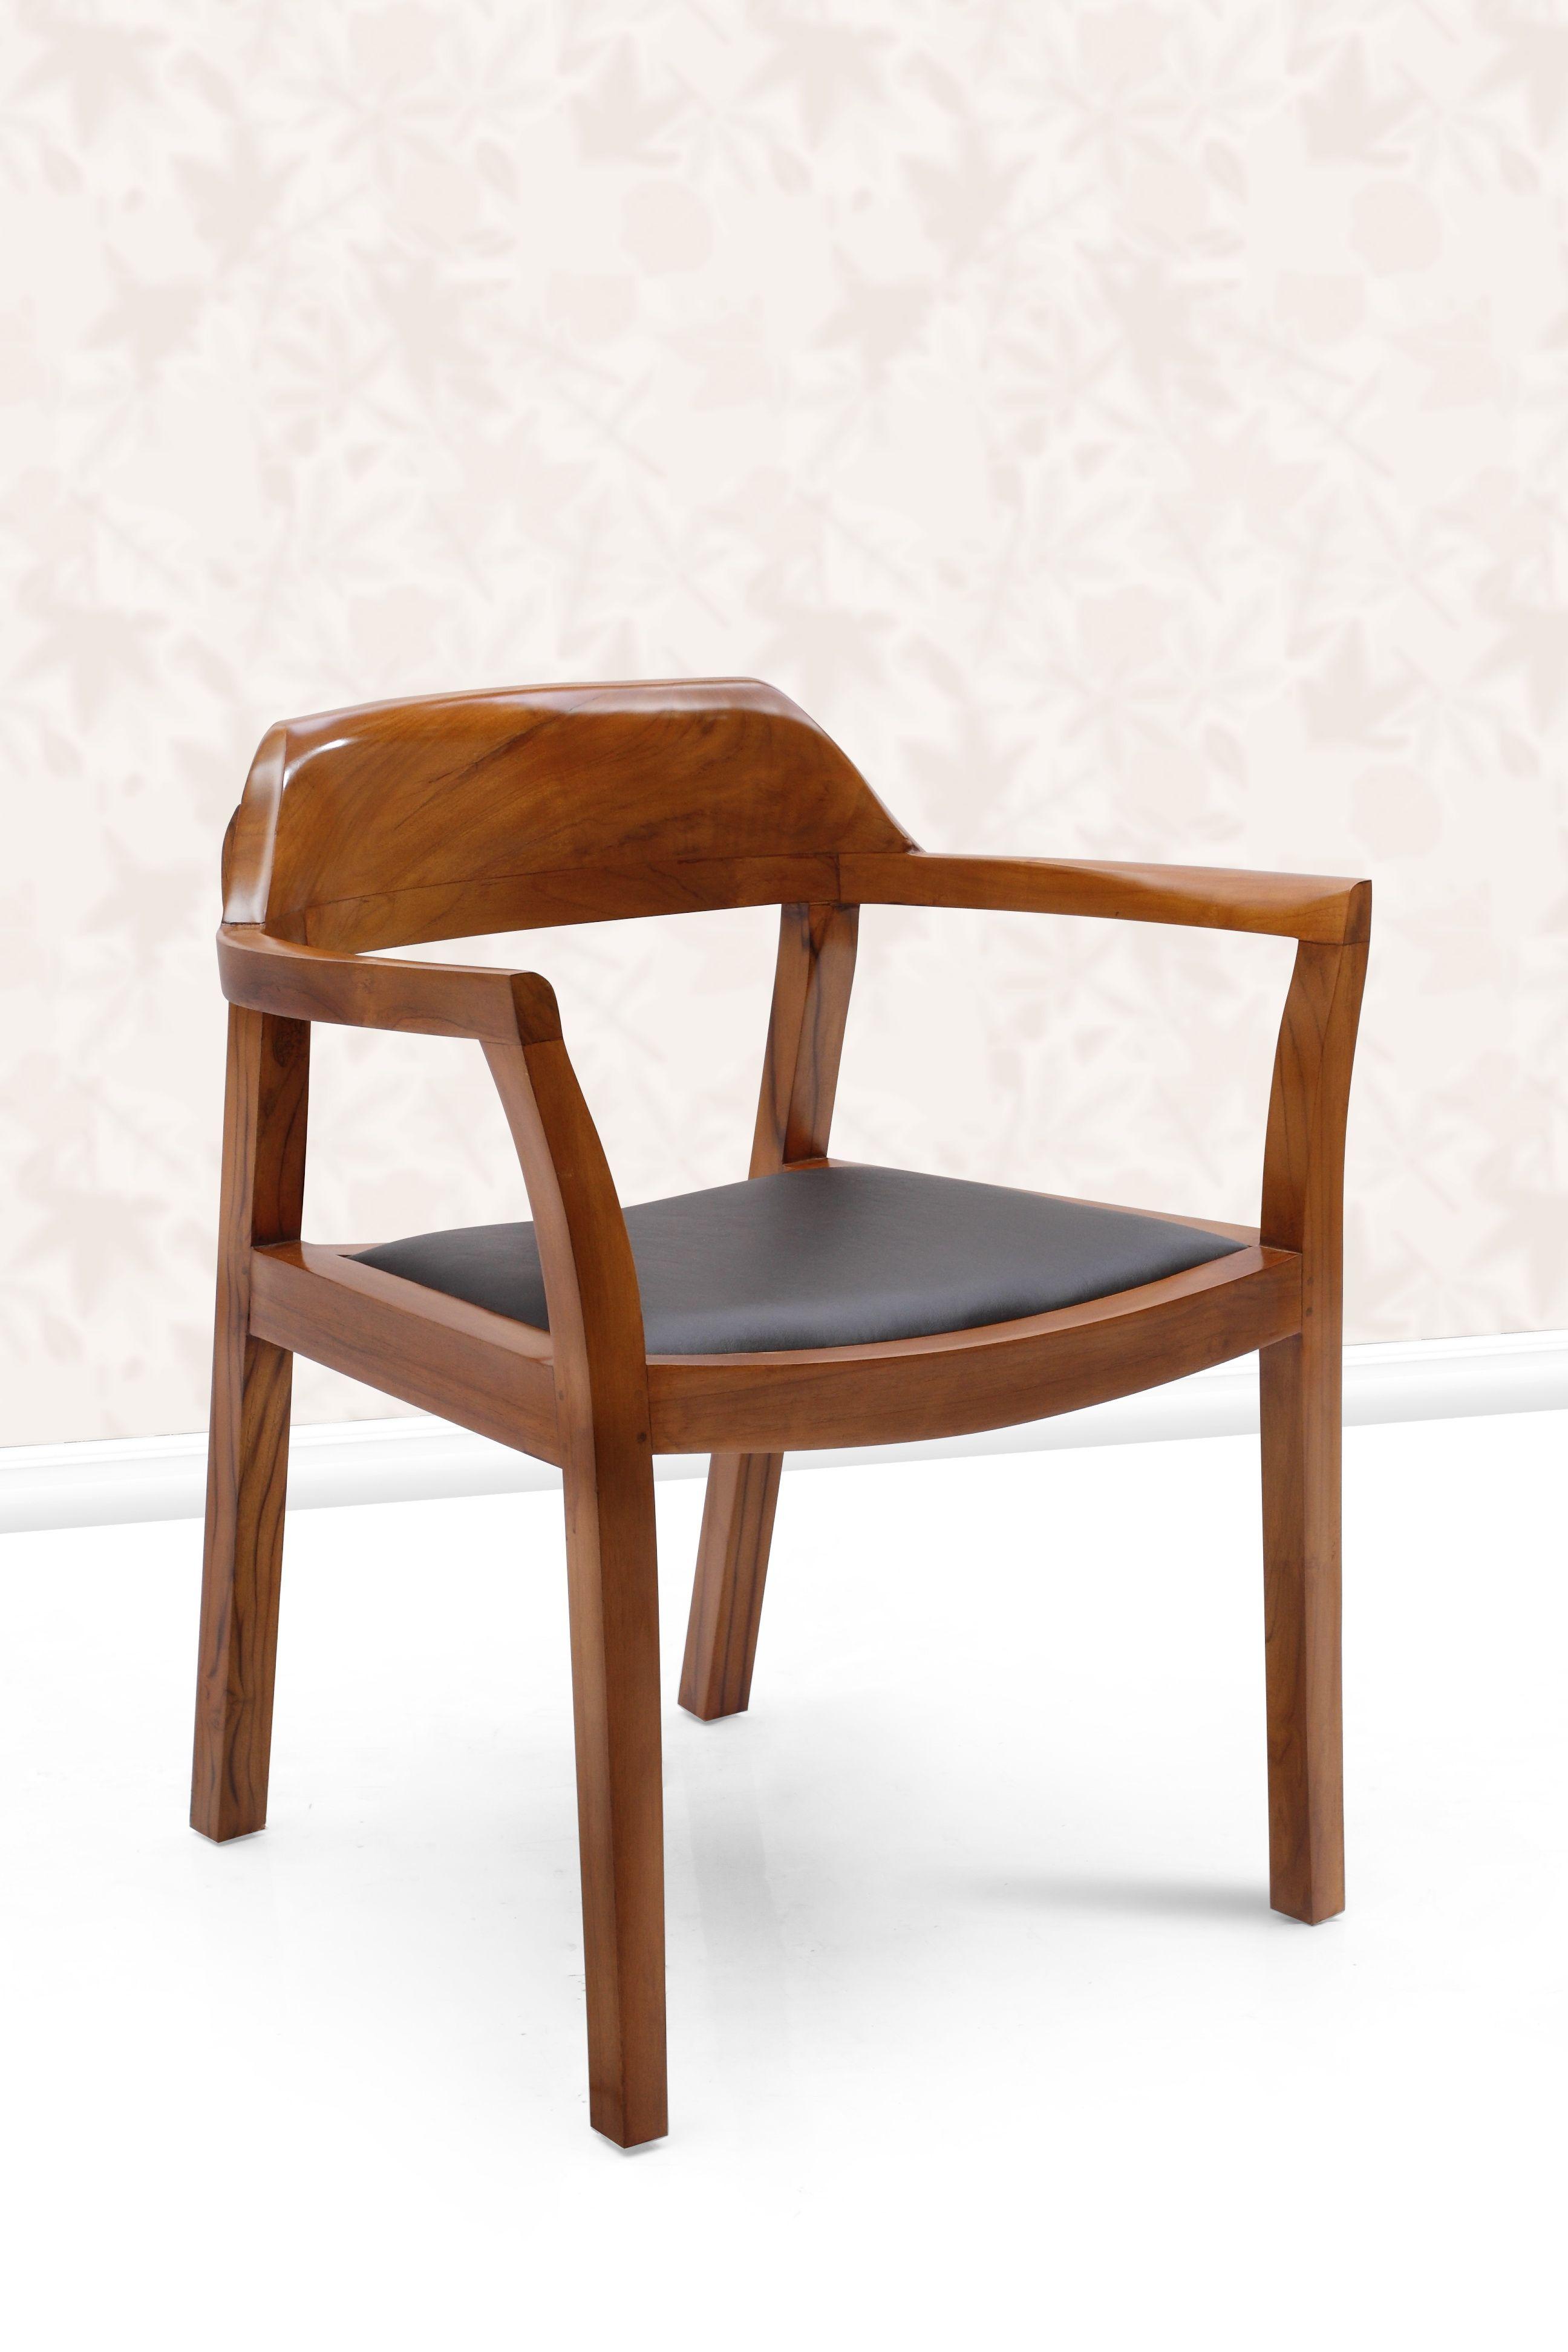 Teak Furniture Malaysia Teak Wood Furniture Shop Selangor Malaysia Teak Wood Furniture Dining Chairs Leather Seat Teak Furniture